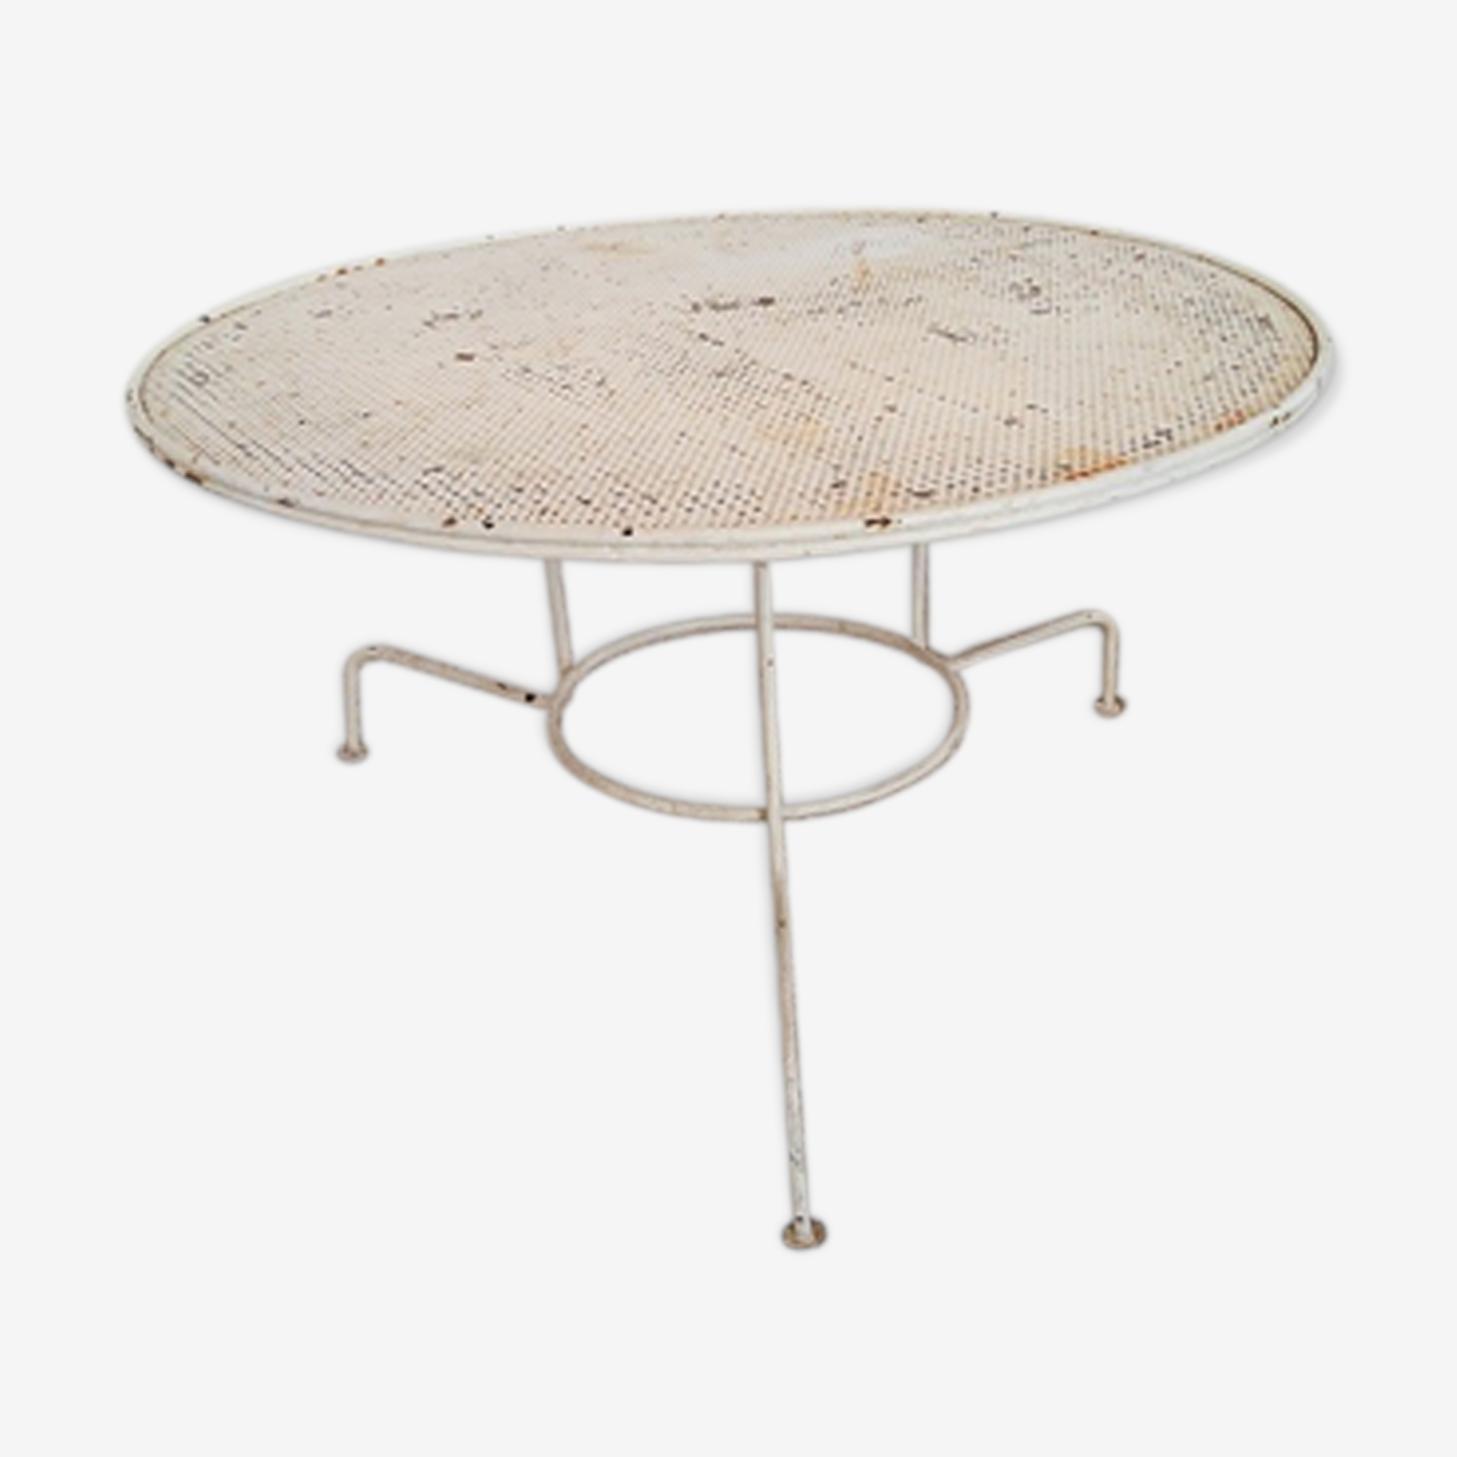 Garden low table tripod metallic vintage